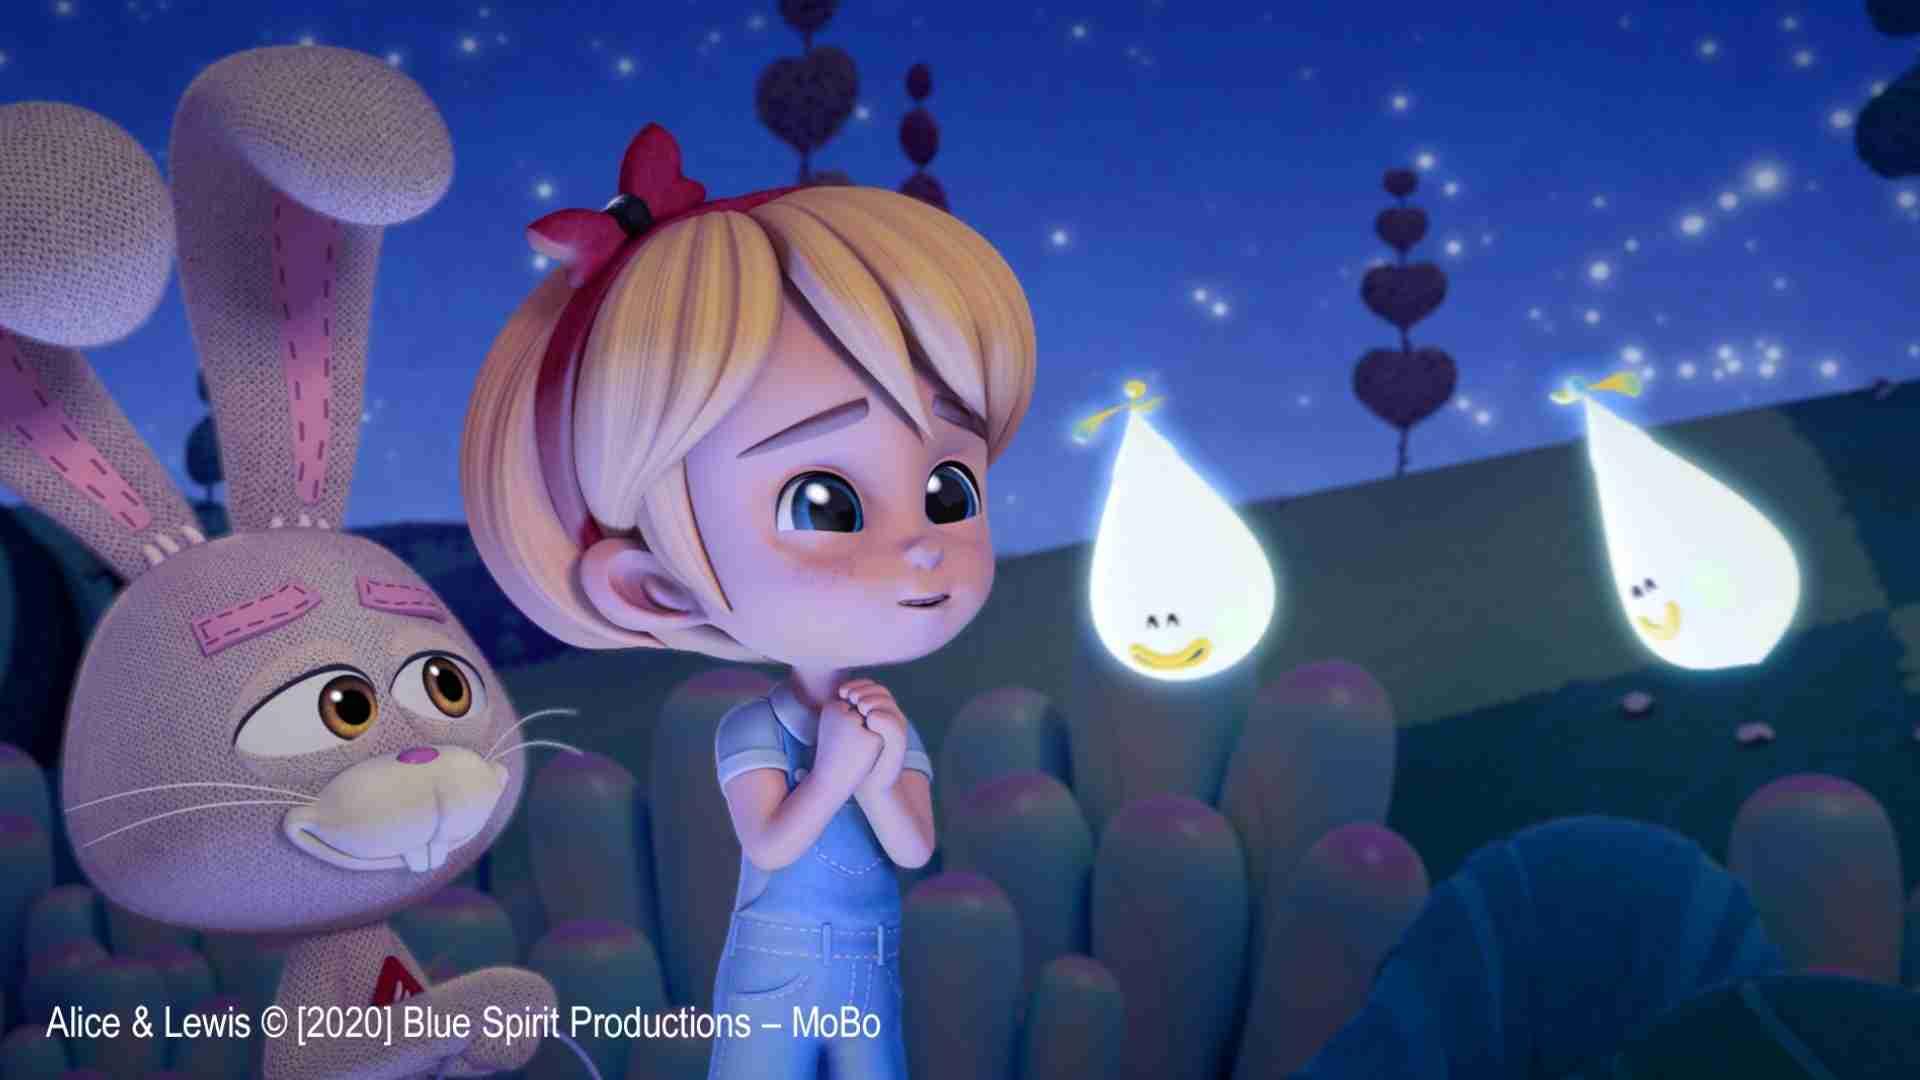 Animated cartoon characters Alice & Lewis